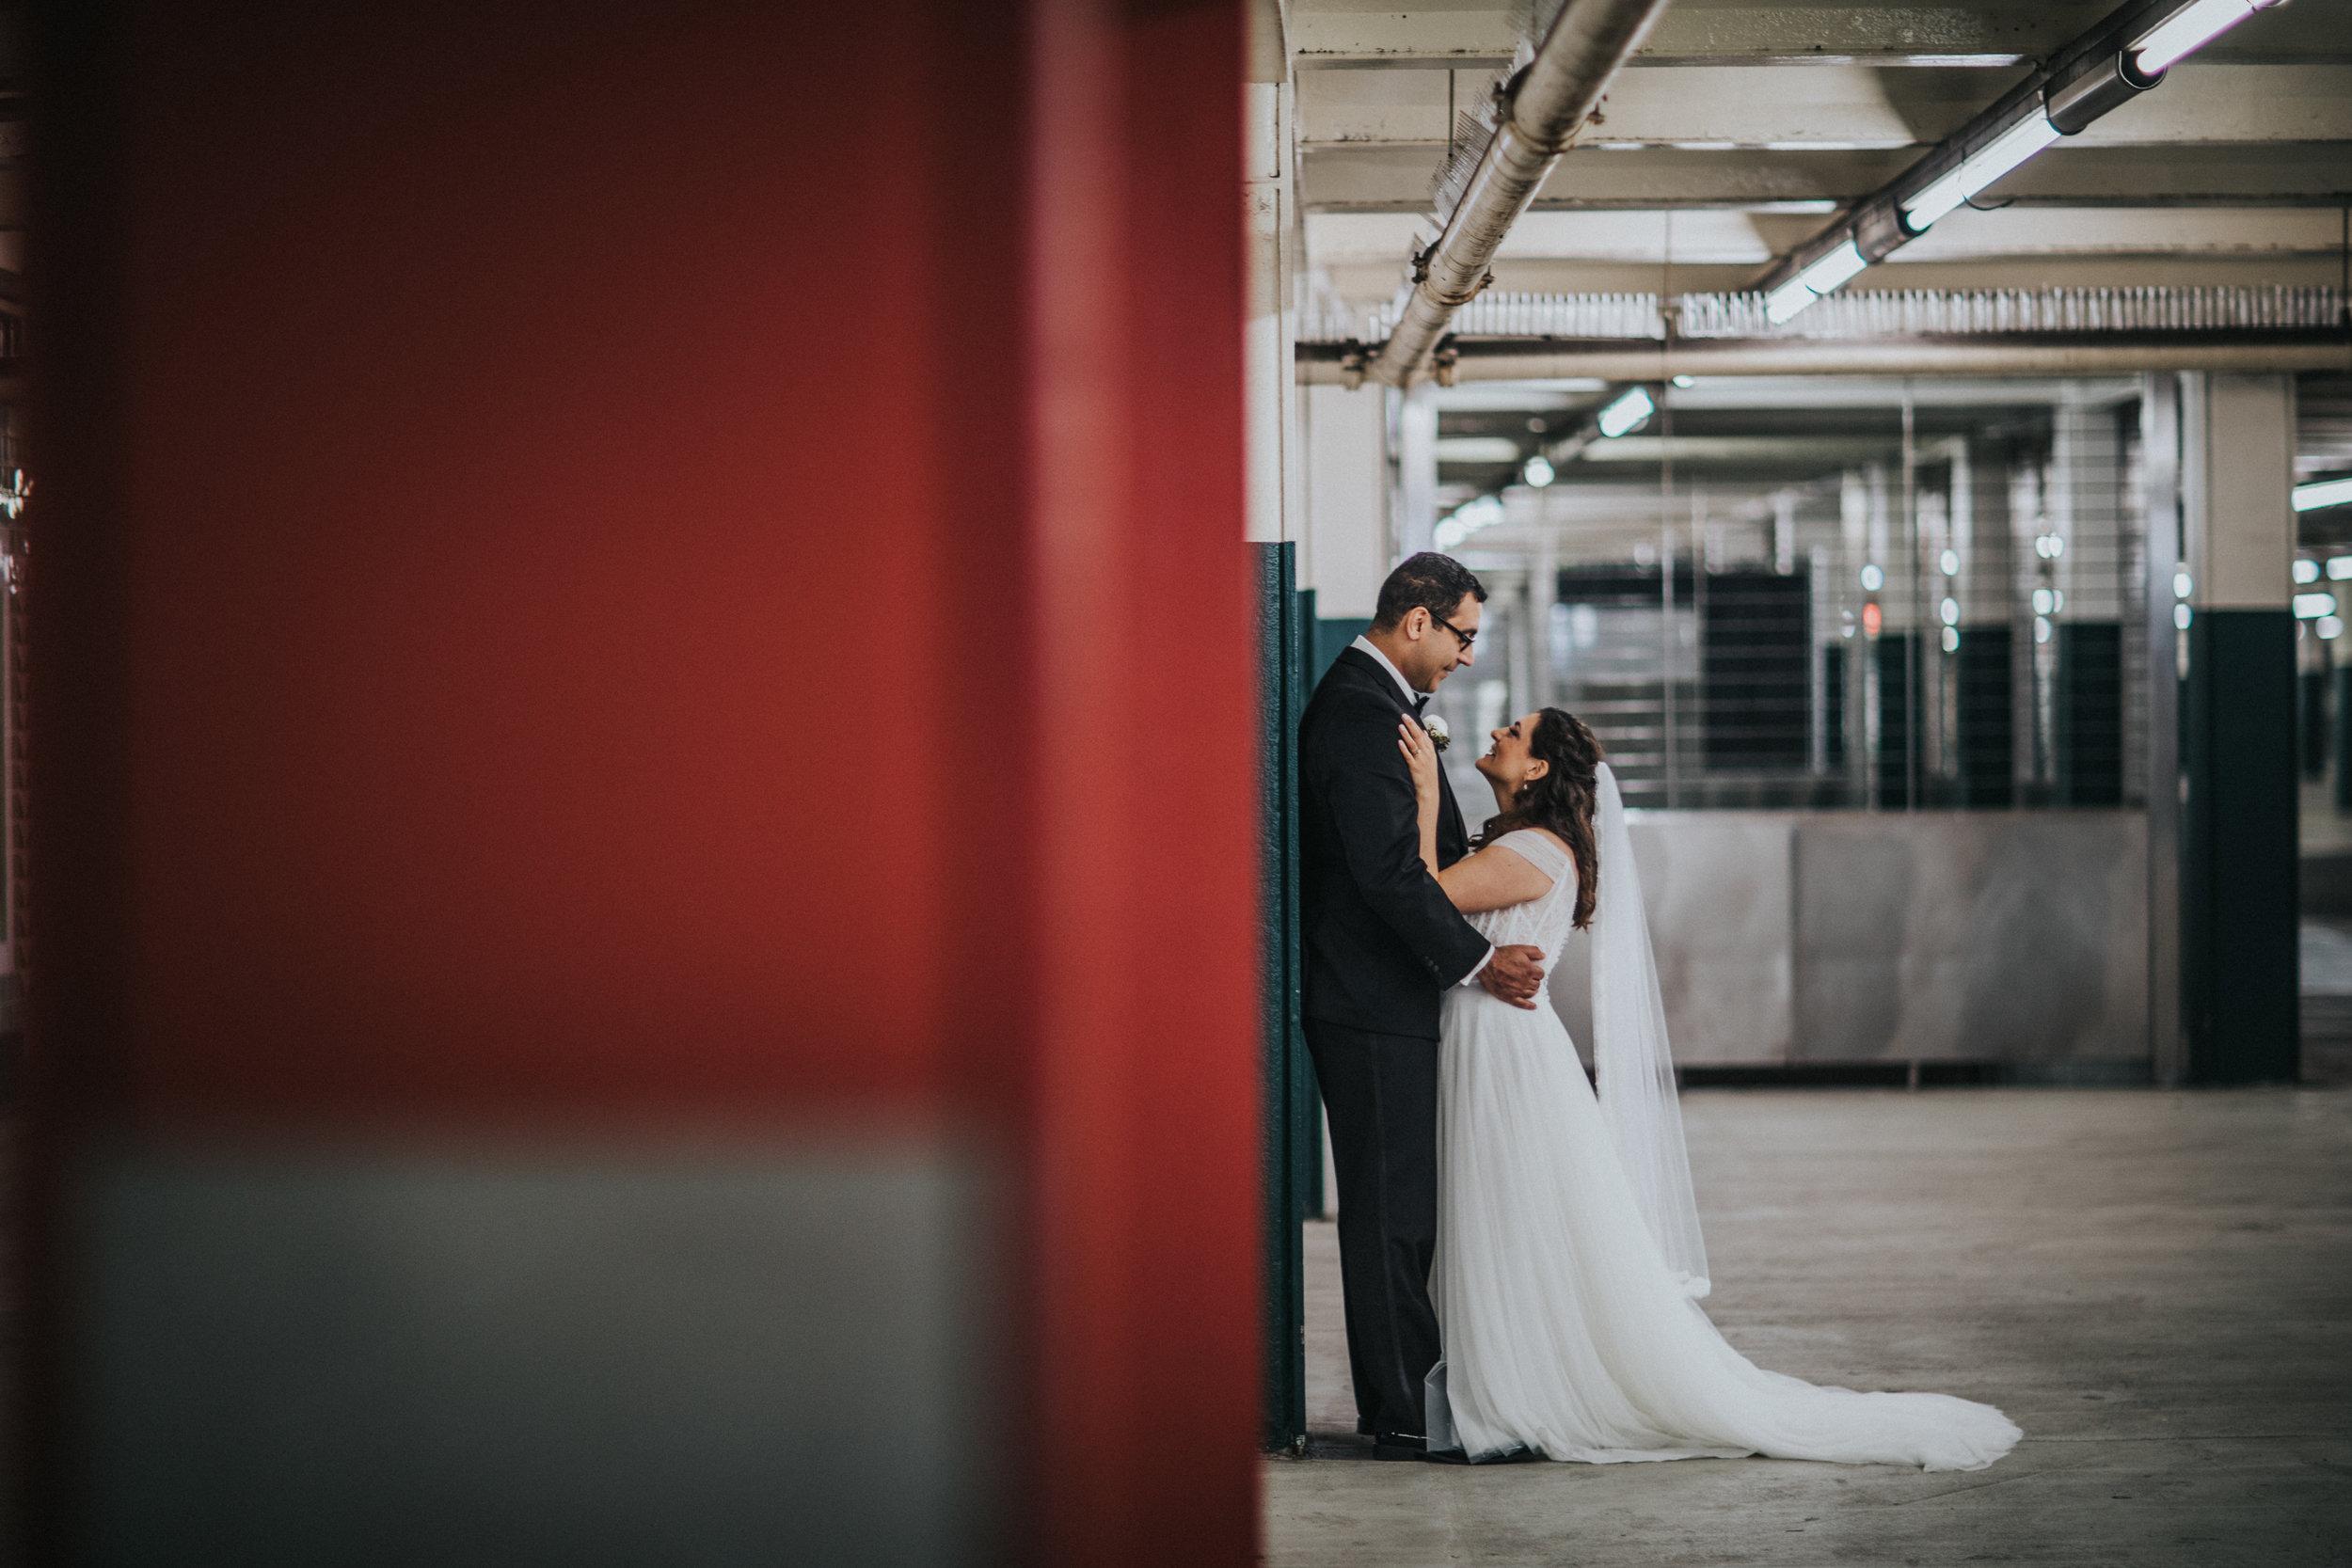 JennaLynnPhotography-NJWeddingPhotographer-Philadelphia-Wedding-ArtsBallroom-BridalParty-88.jpg